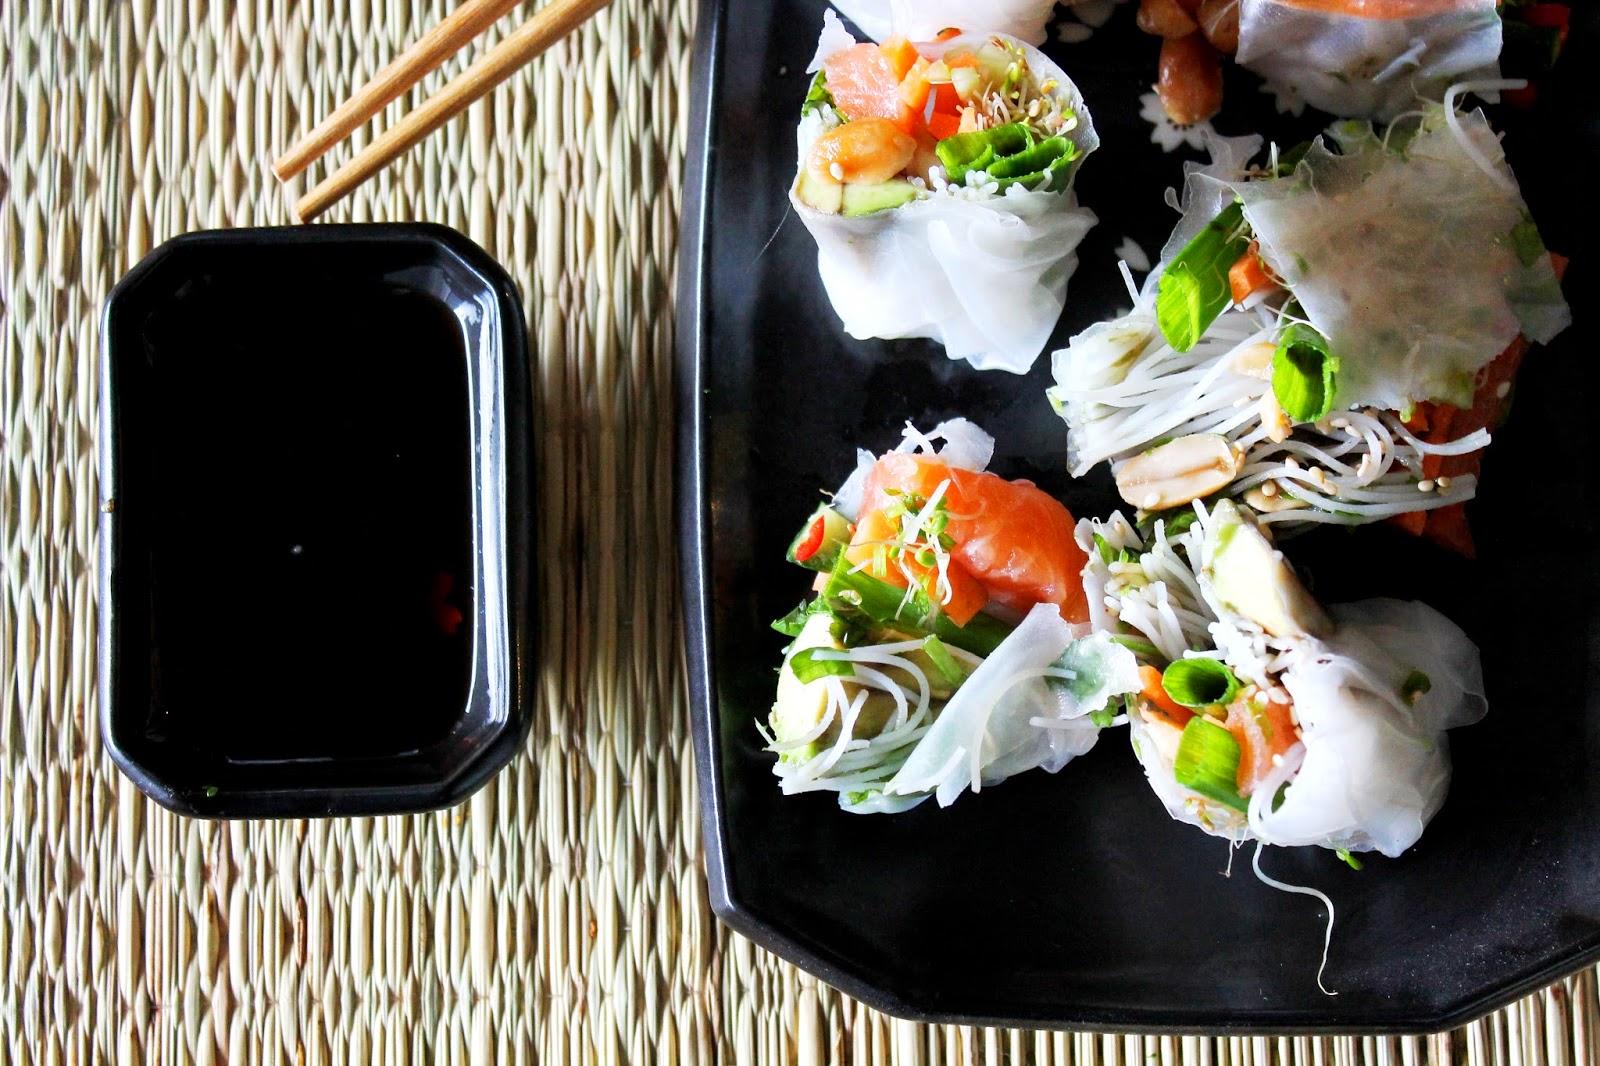 Beautiful food photography   Alinan kotona blog #asianfood #ricepaperrolls #springrolls #photography